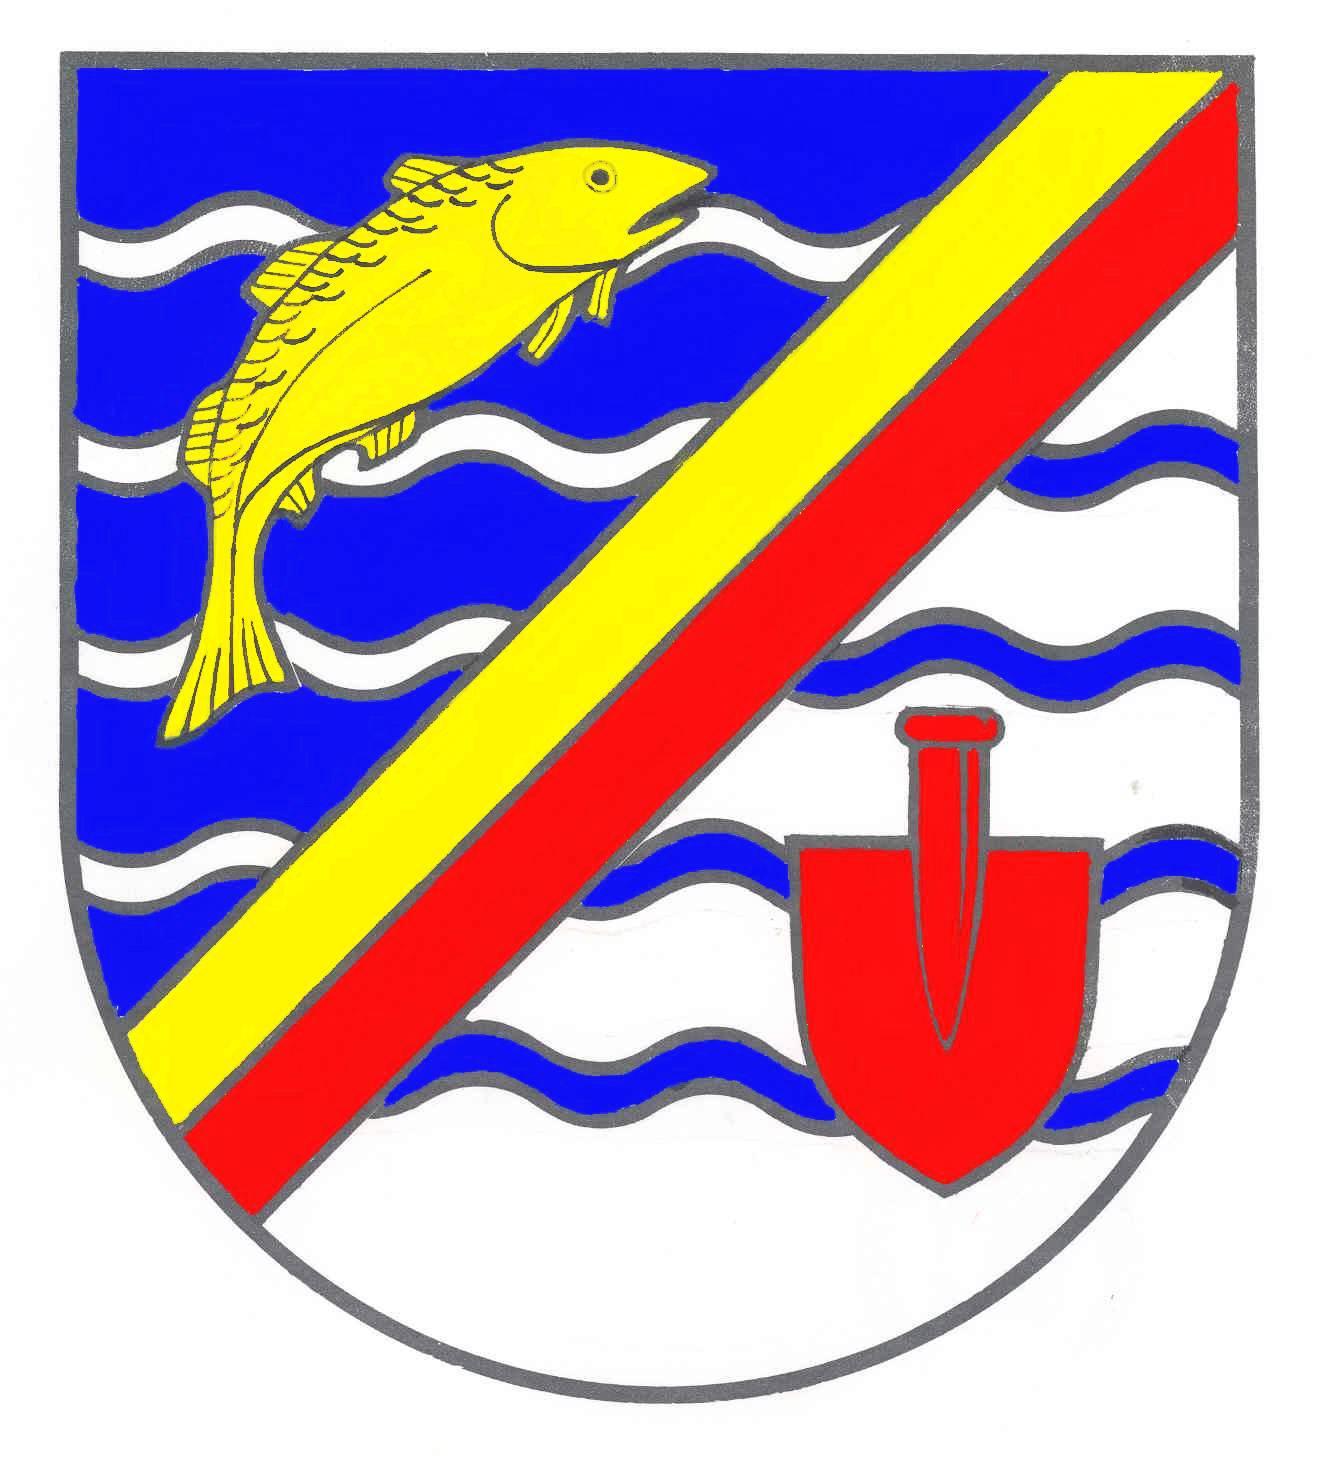 Wappen GemeindeWendtorf, Kreis Plön